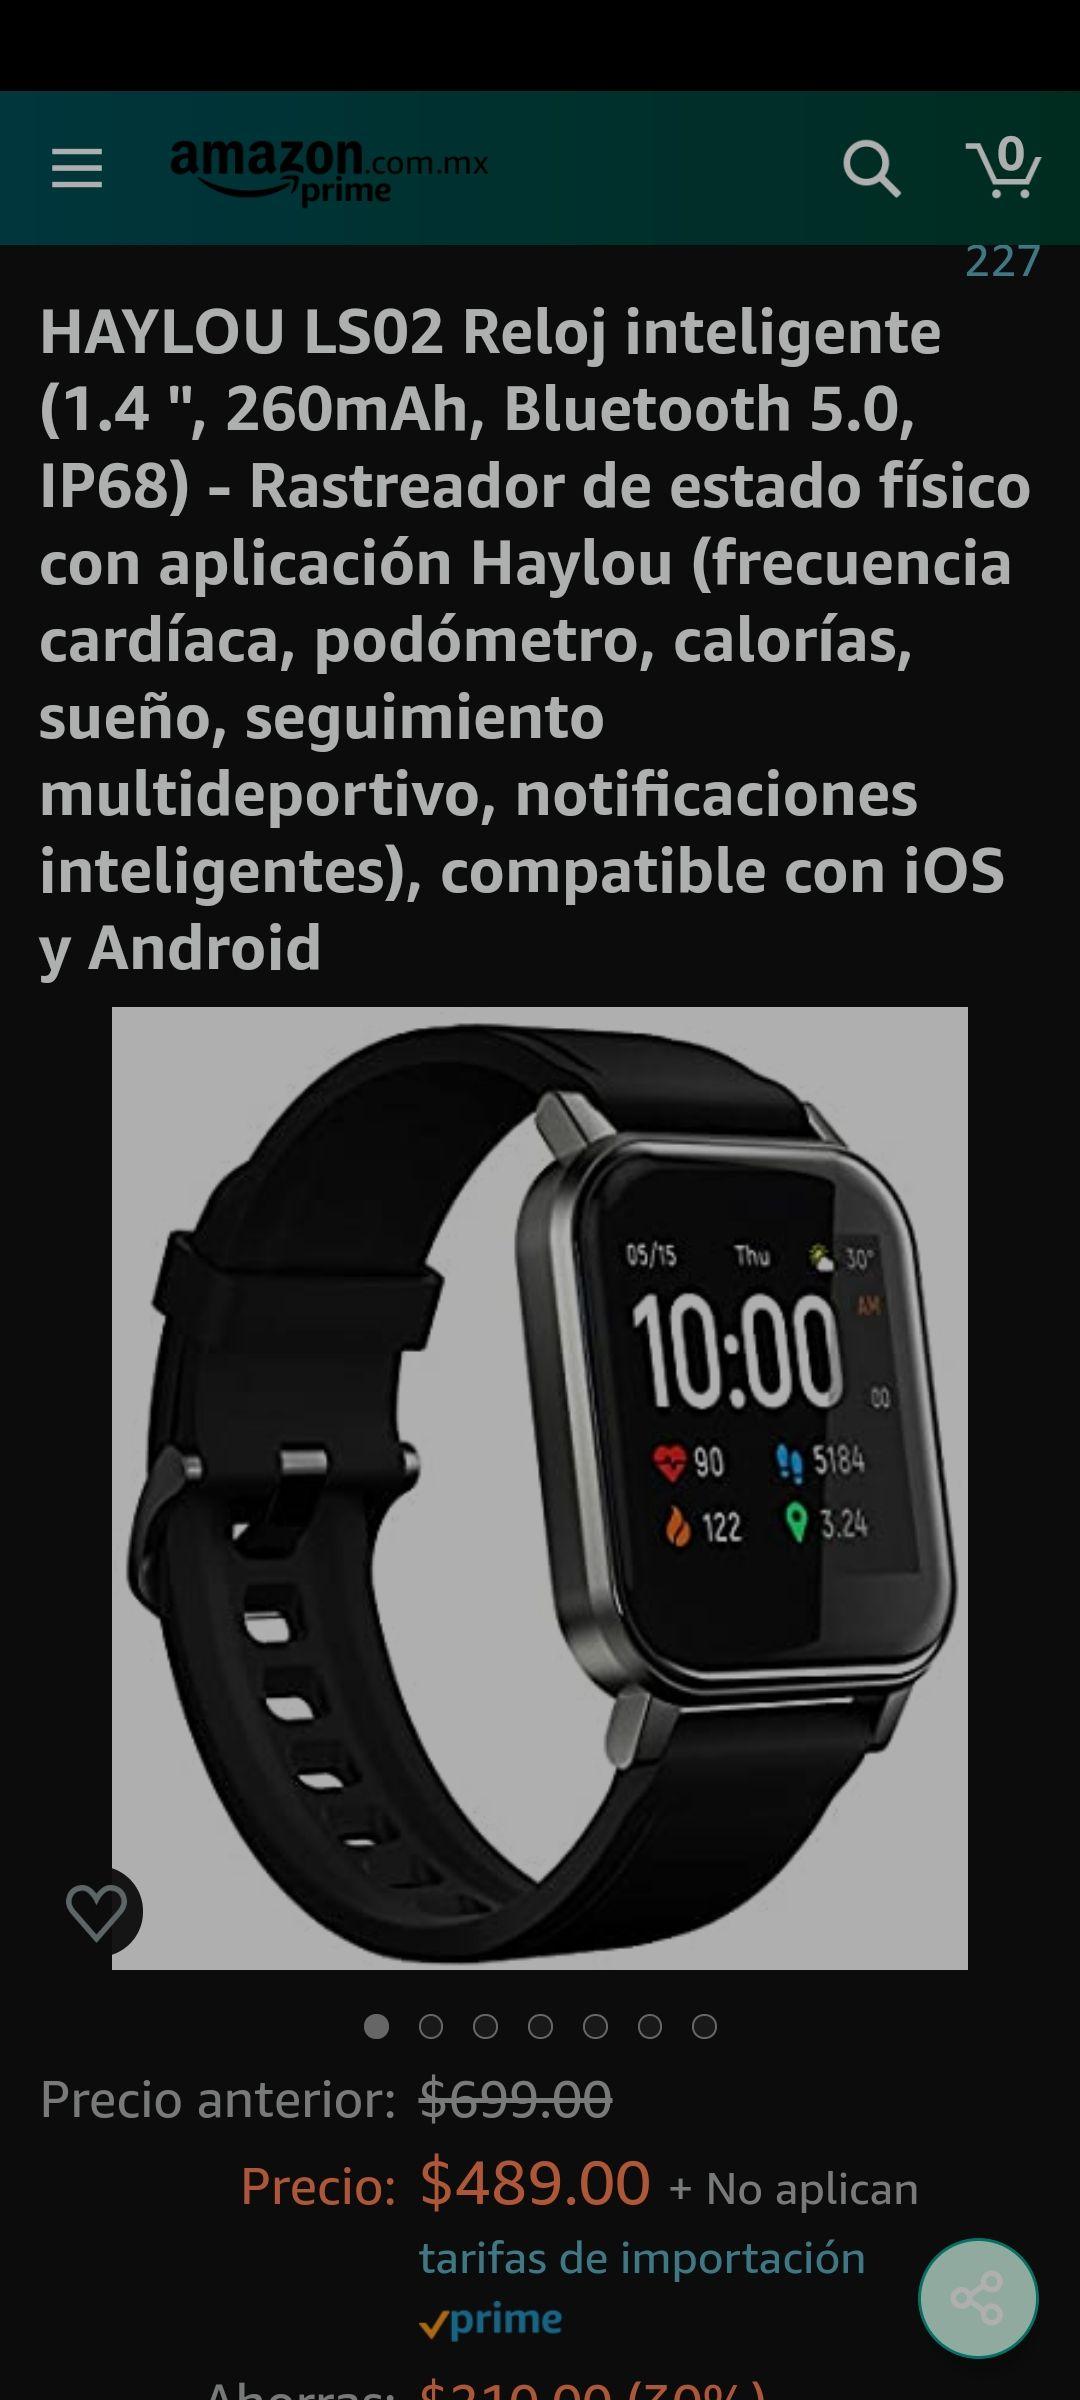 Amazon: HAYLOU LS02 Reloj inteligente